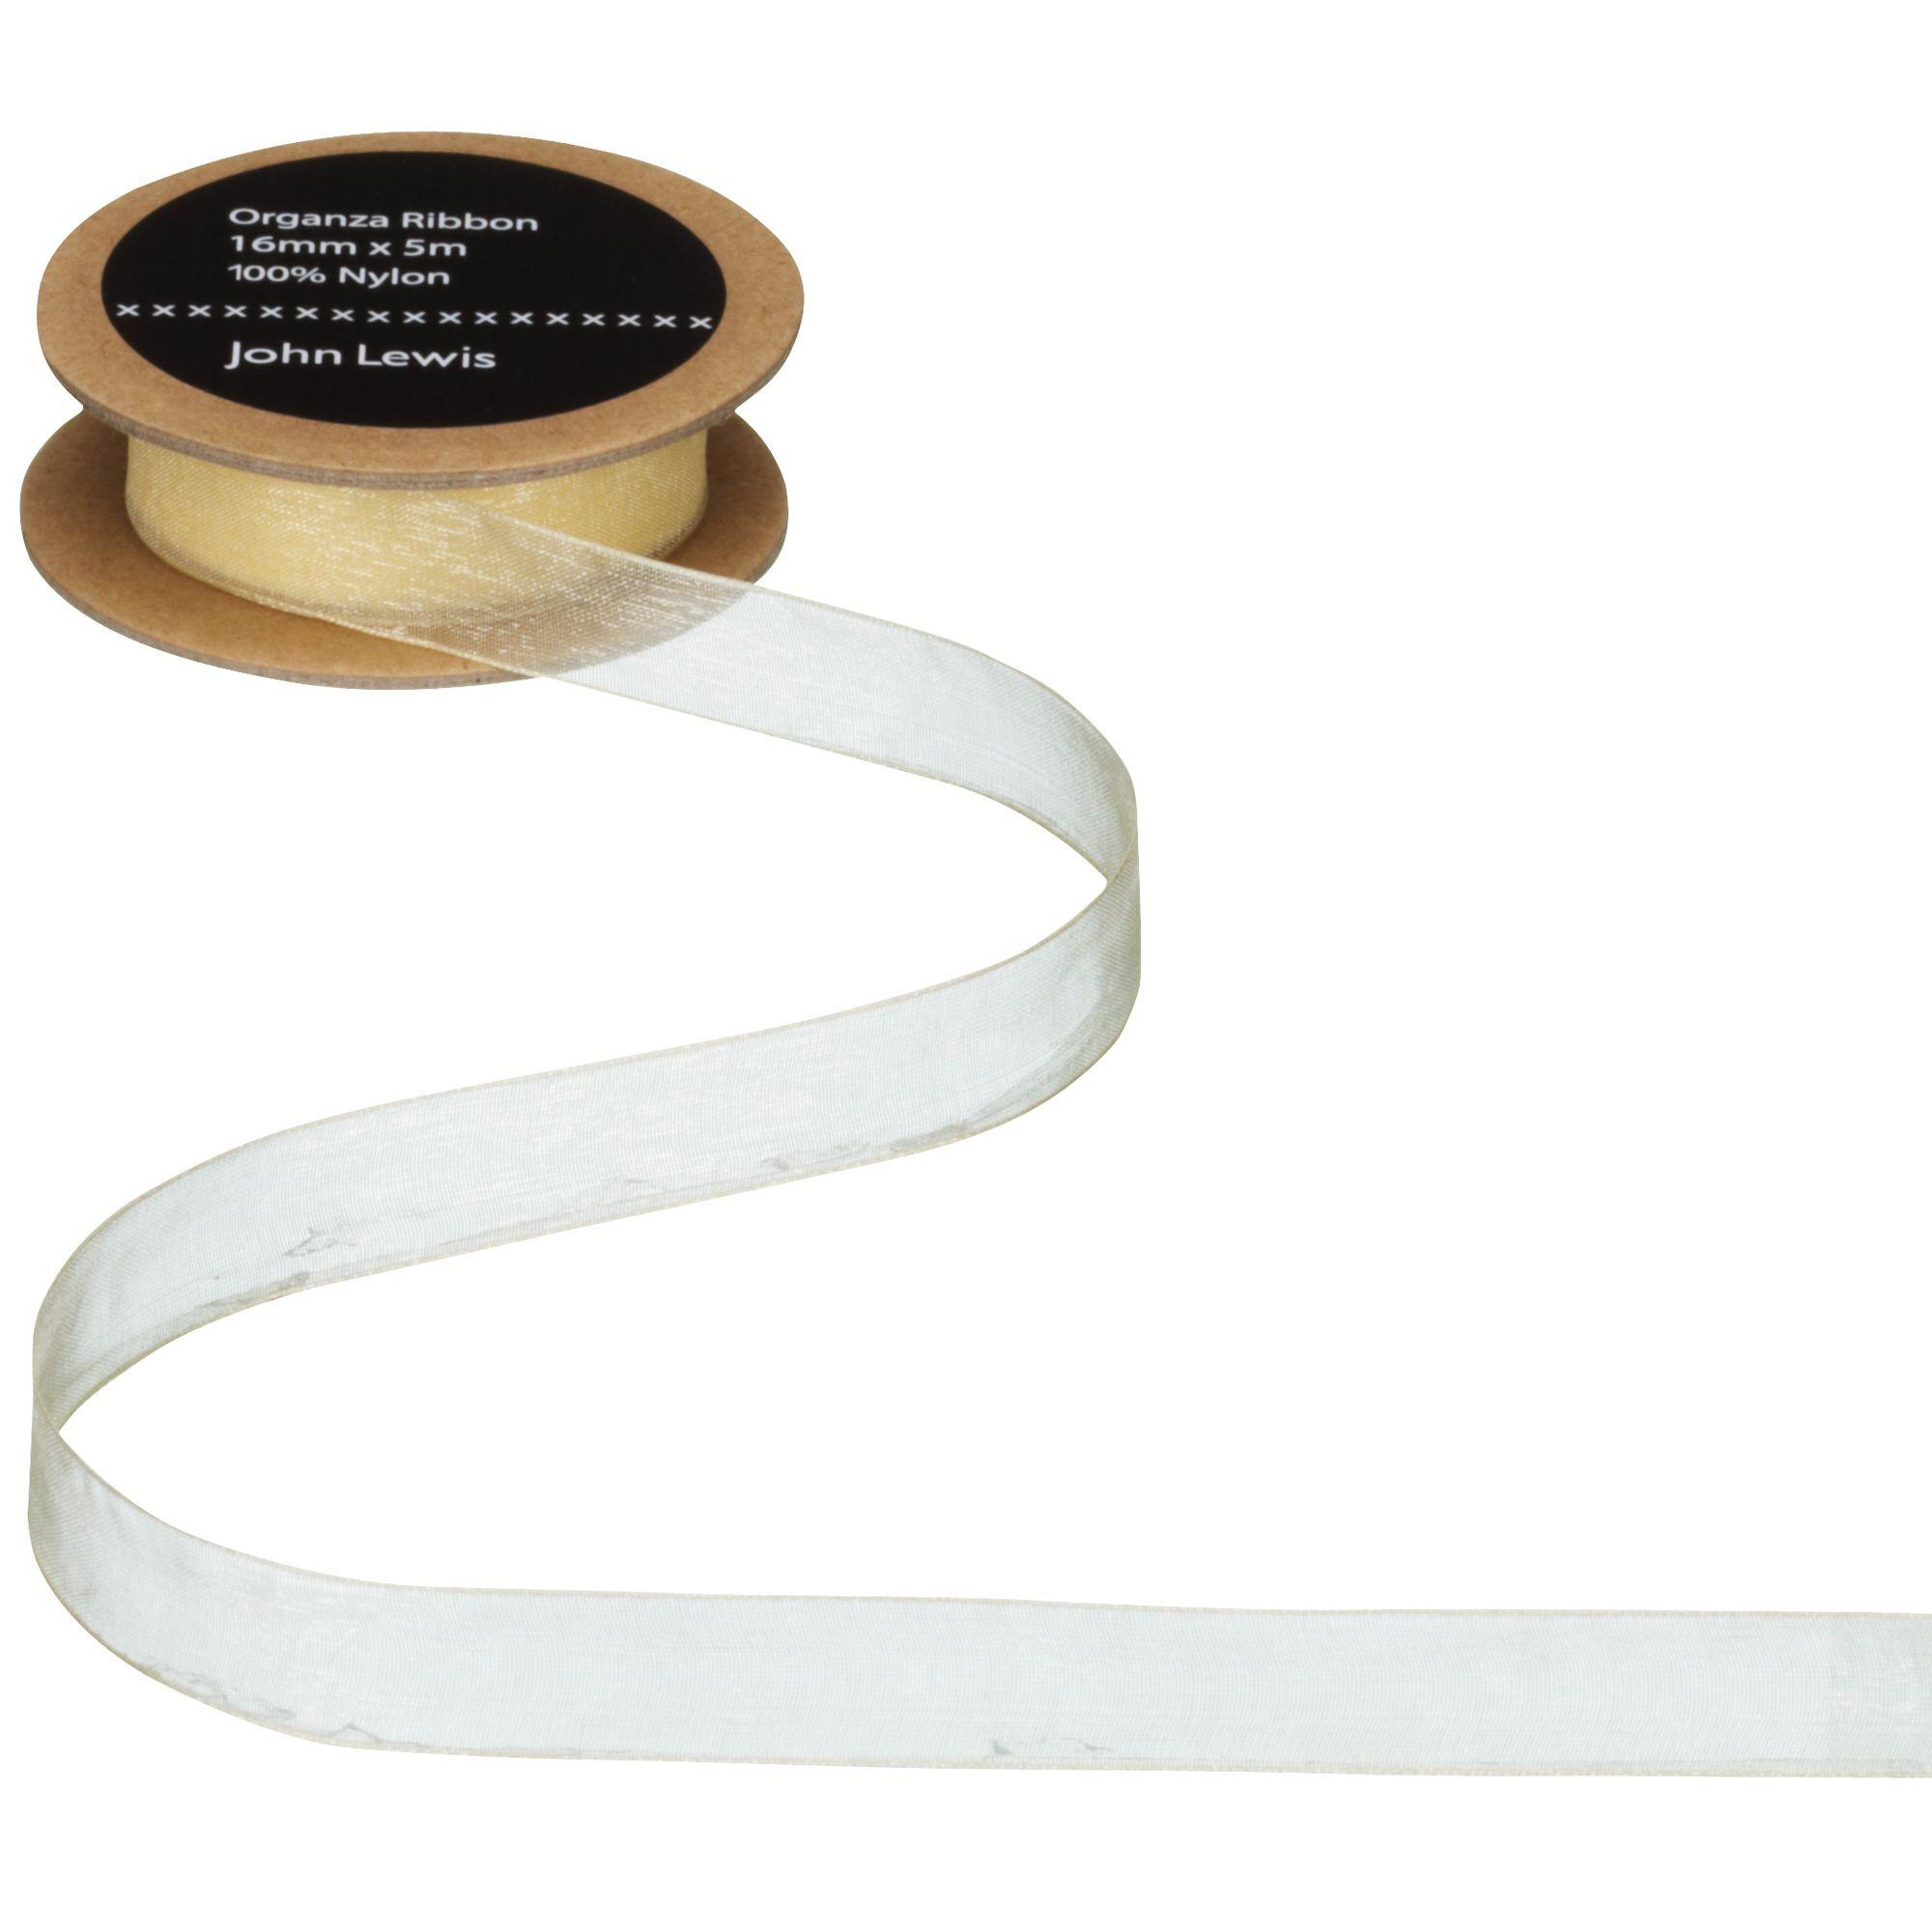 John Lewis & Partners Woven Edge Organza Ribbon  - Ivory - Size: 38mm